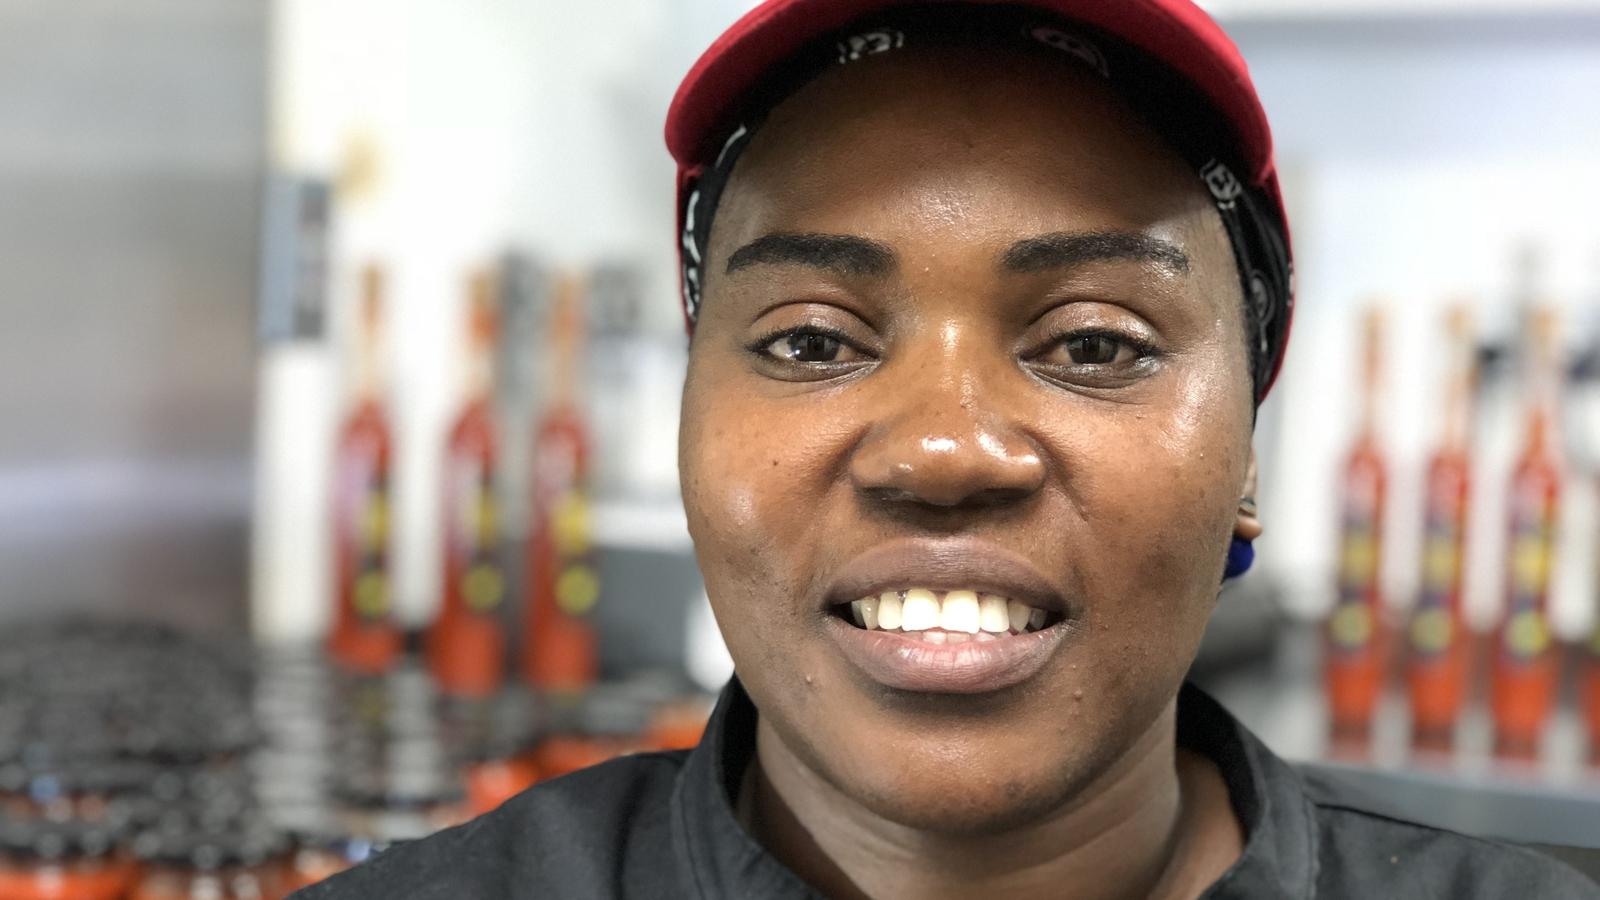 Image - Ellie Kisyombe, an asylum seeker from Malawi, who lives in Dublin